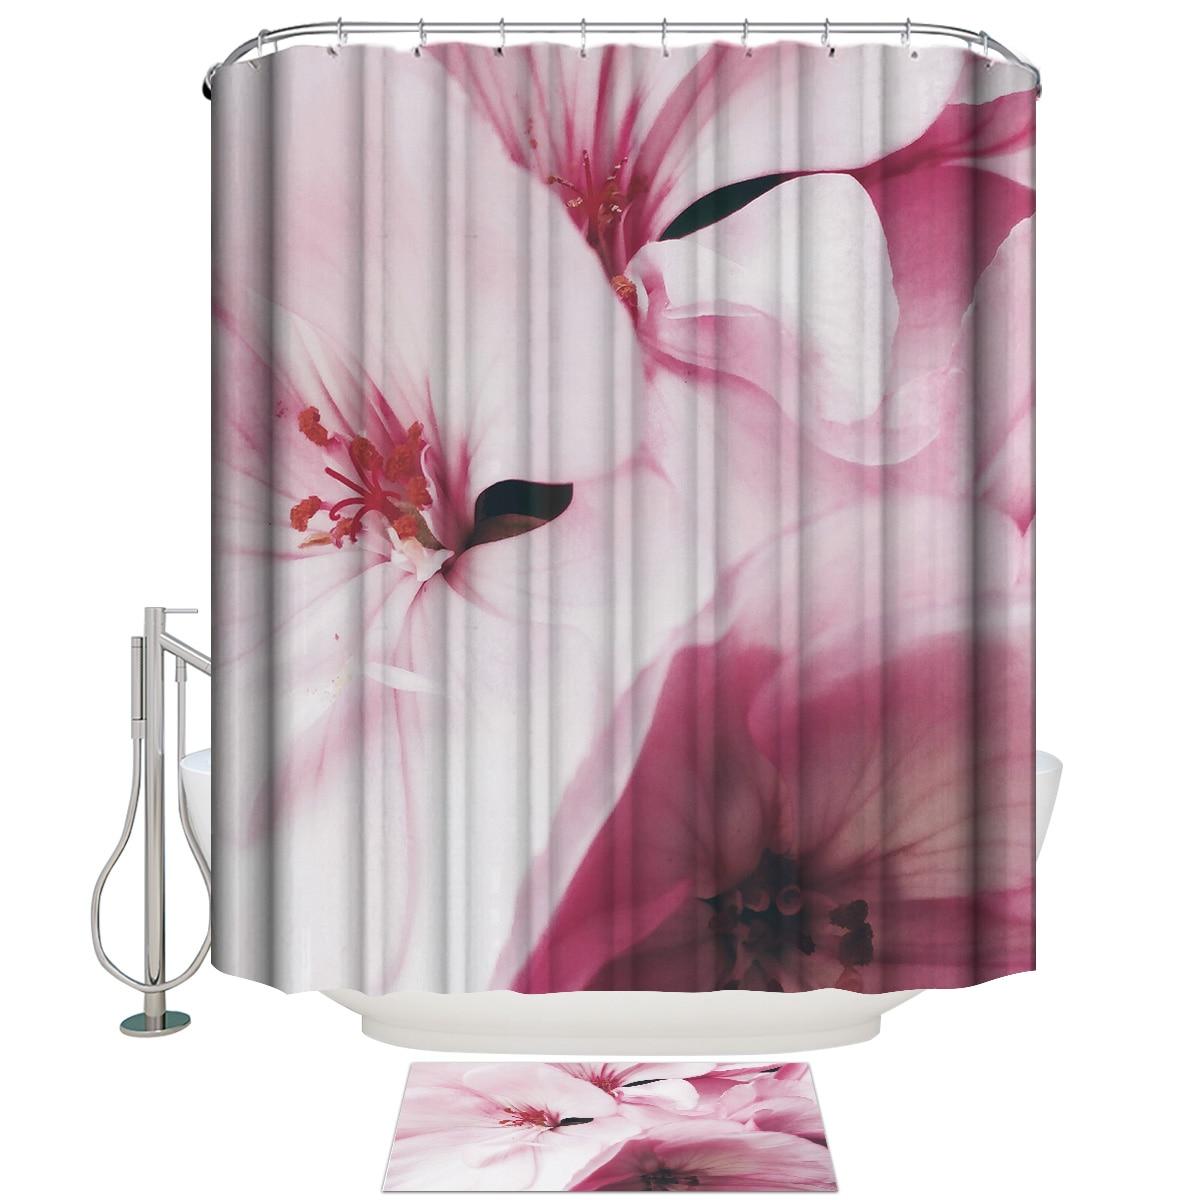 Close-up de pétalas rosa cortina de chuveiro conjunto de tecido impermeável